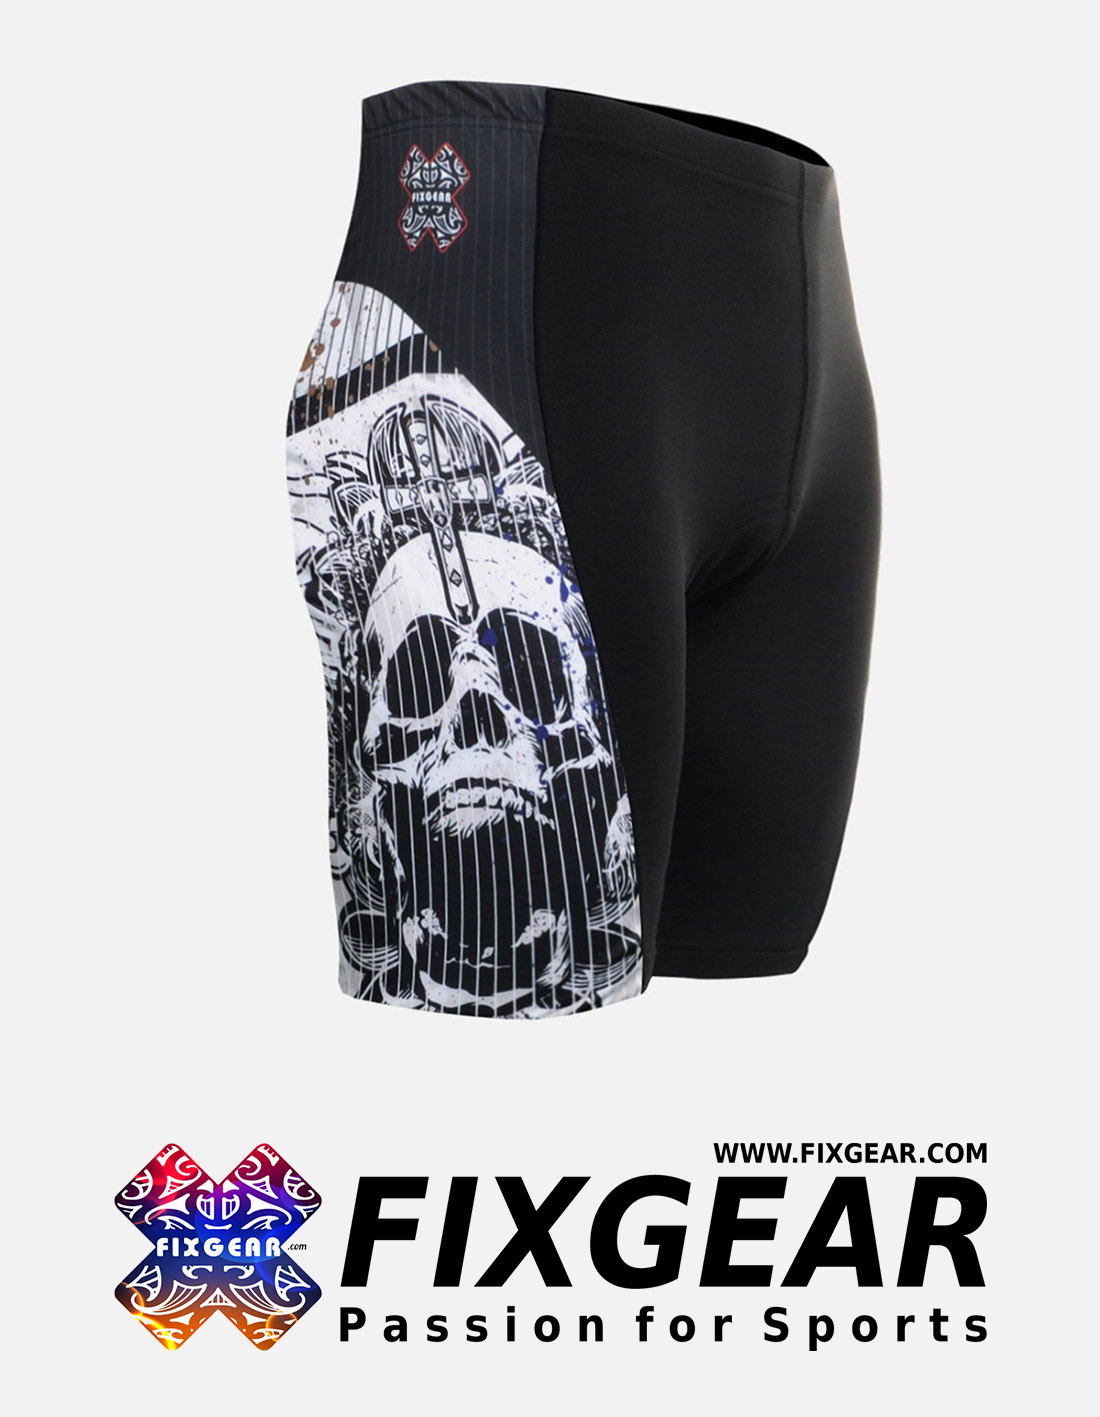 FIXGEAR ST-W9 Women's Cycling Padded Shorts